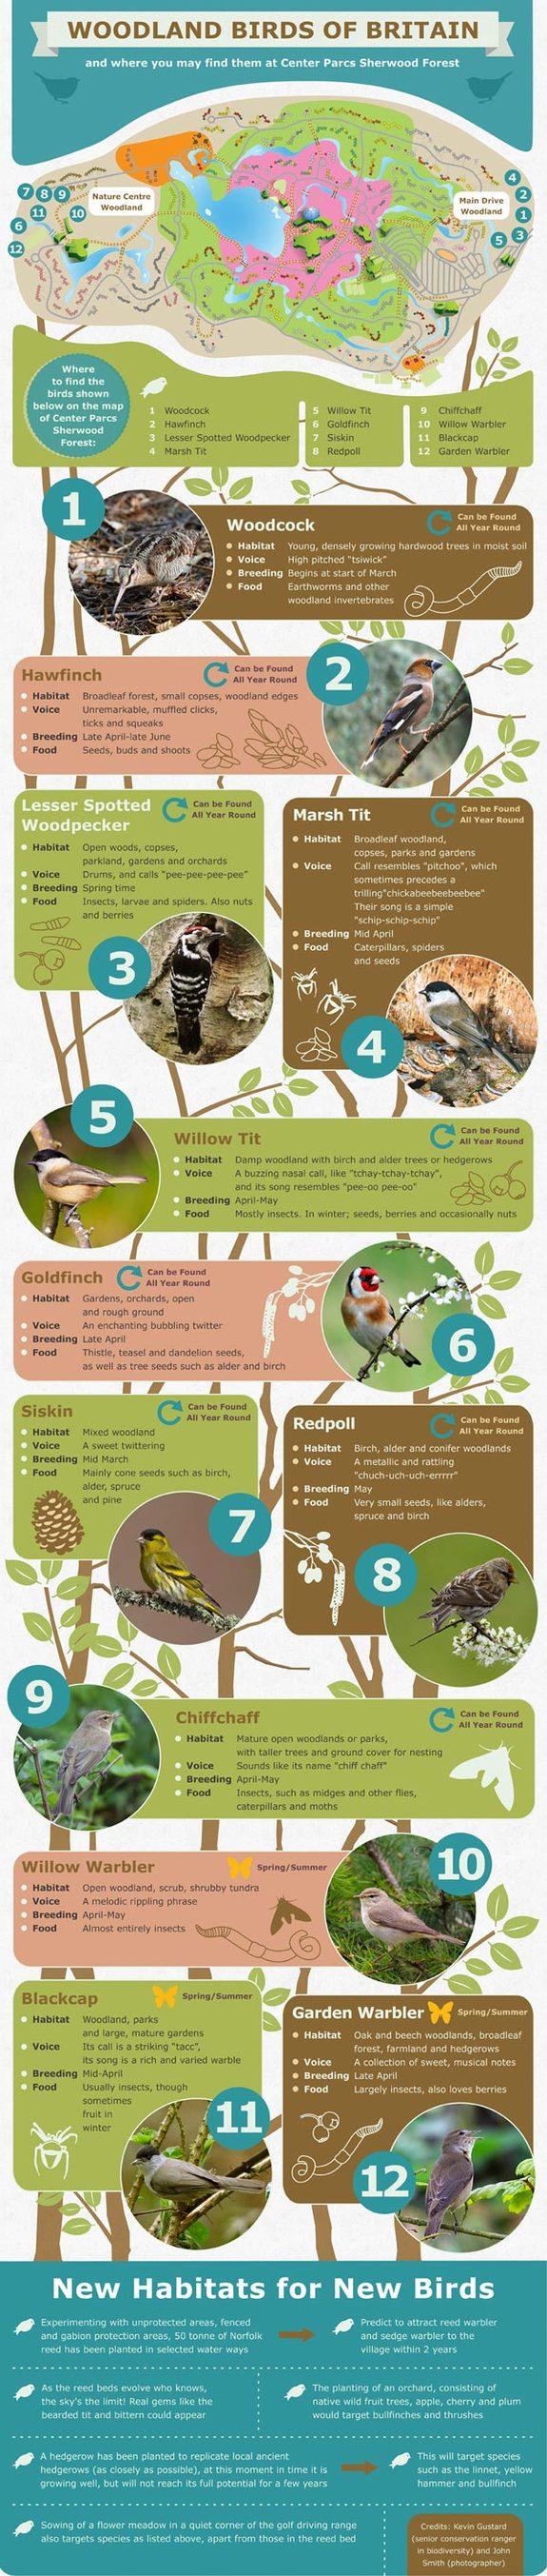 Woodland Birds of Britain Infographic